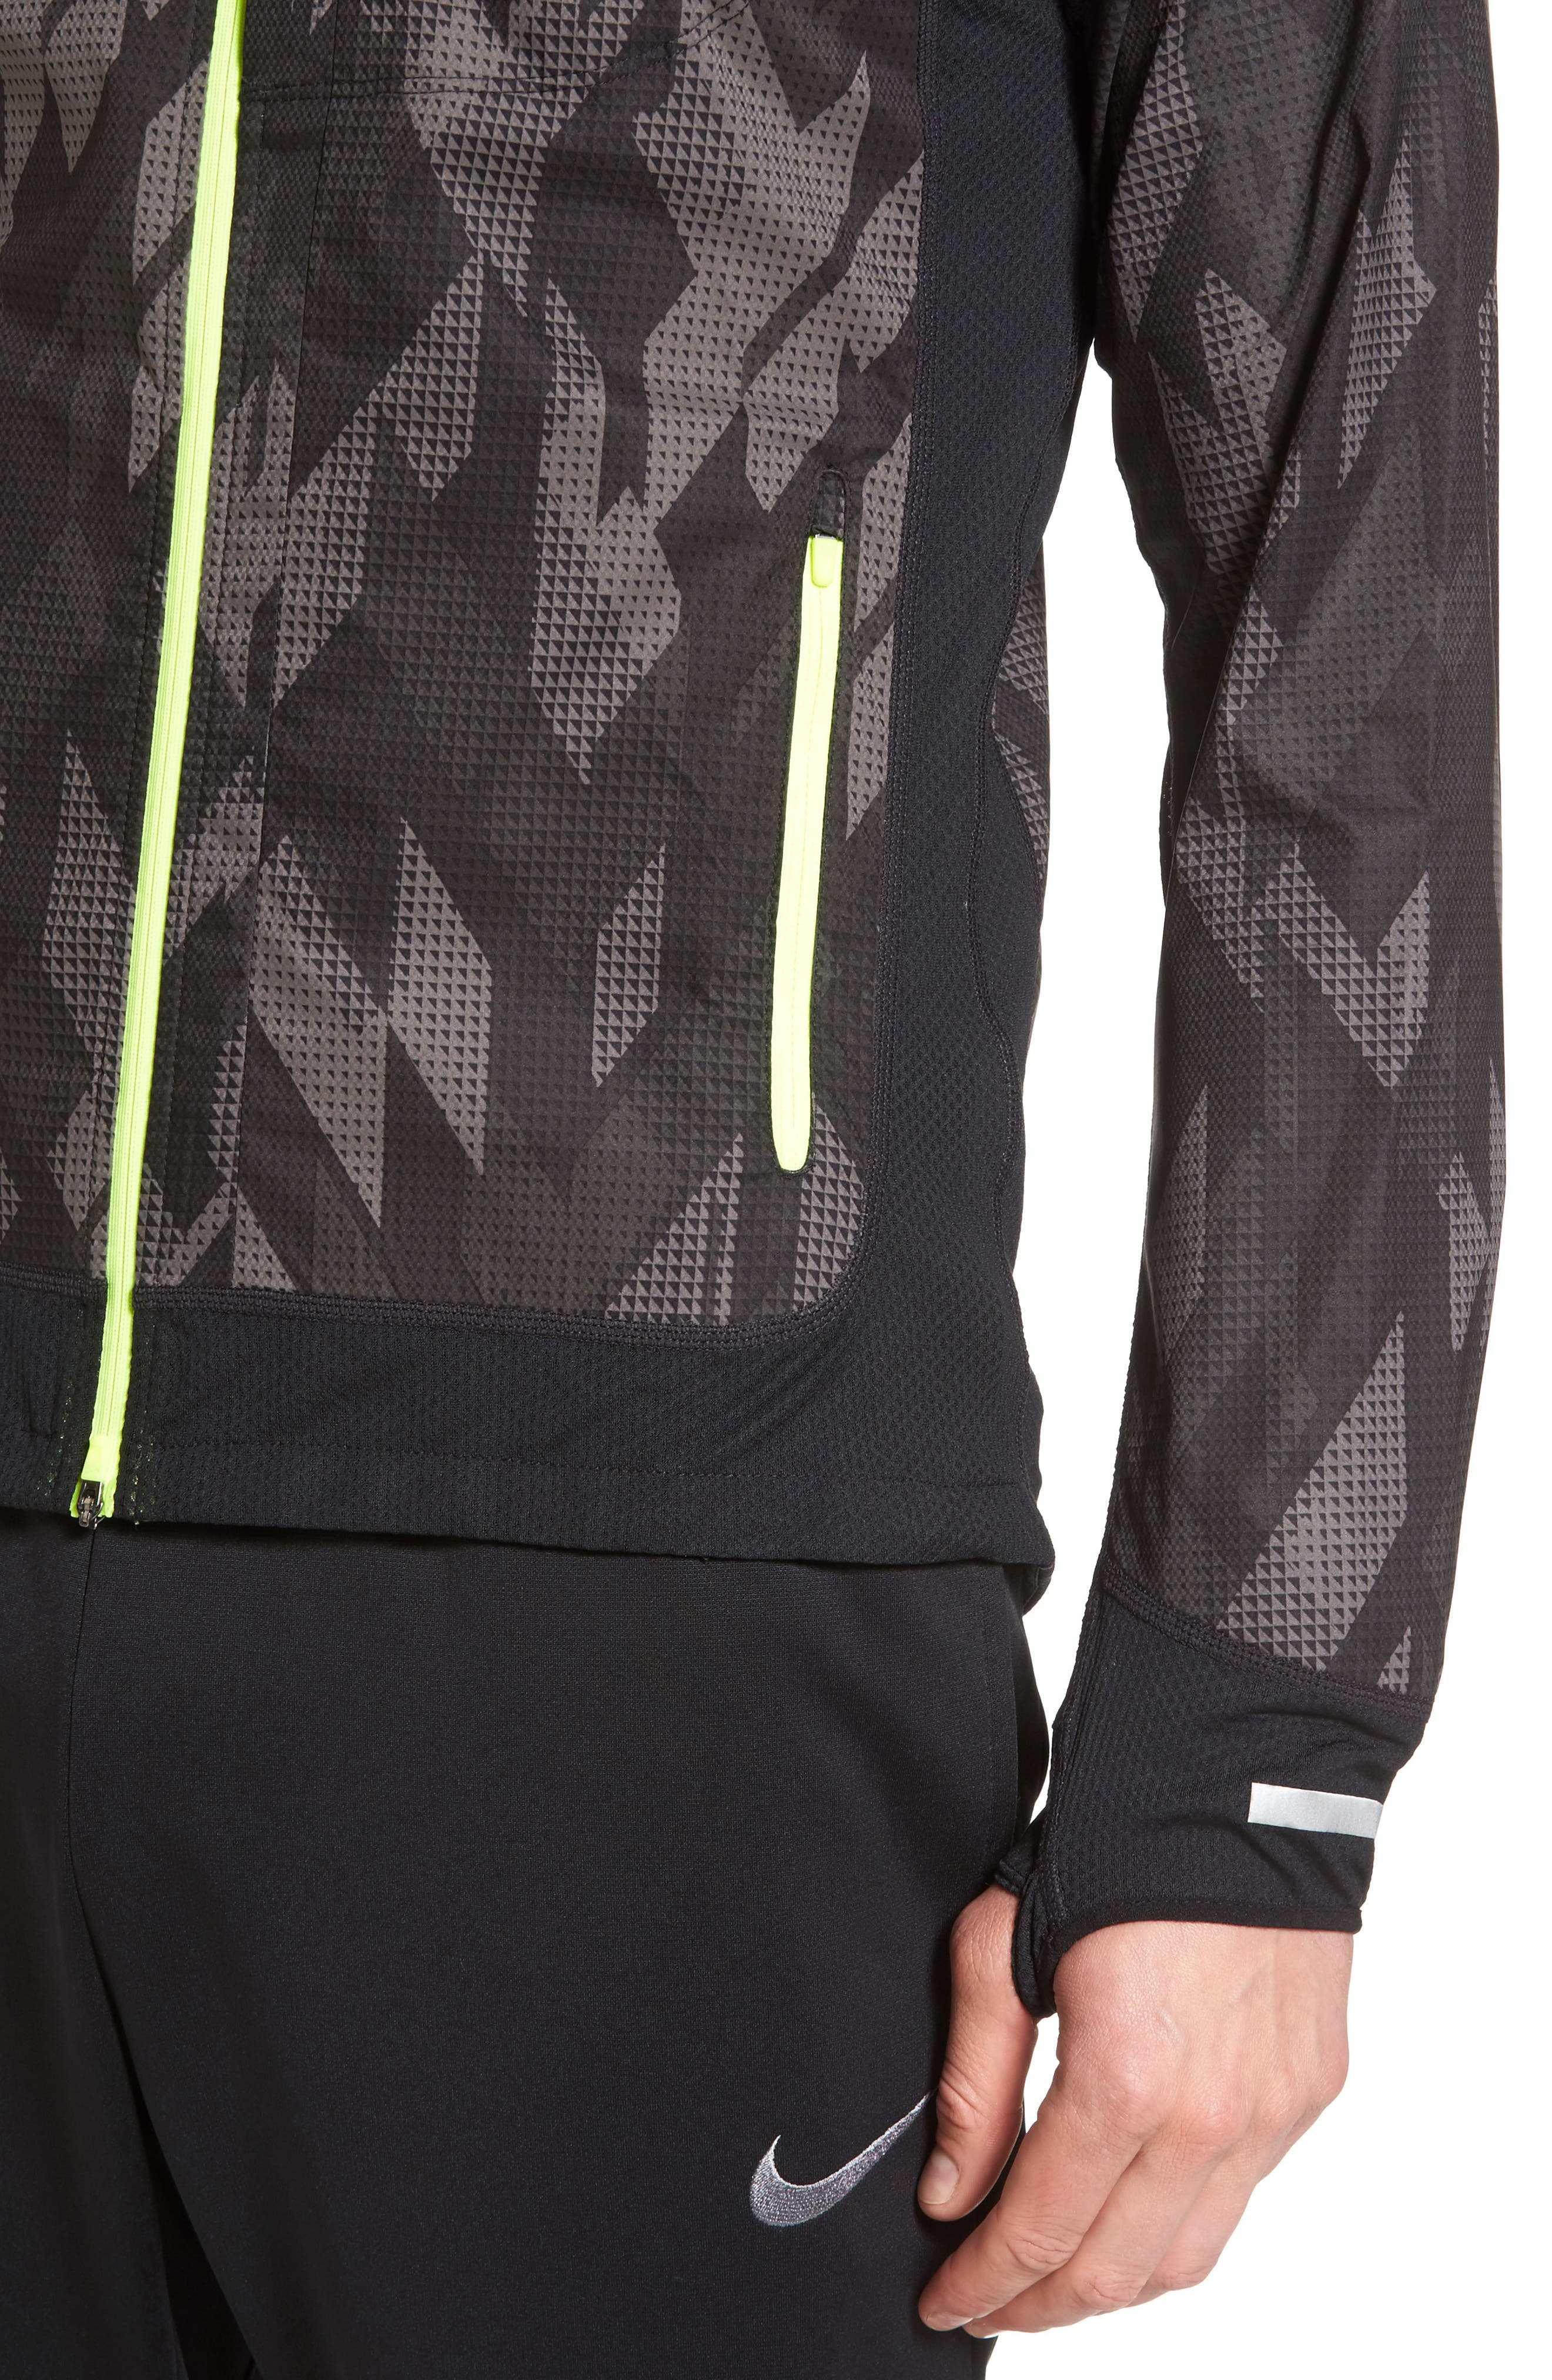 Flex Running Jacket,                             Alternate thumbnail 3, color,                             Black/ Black/ Volt